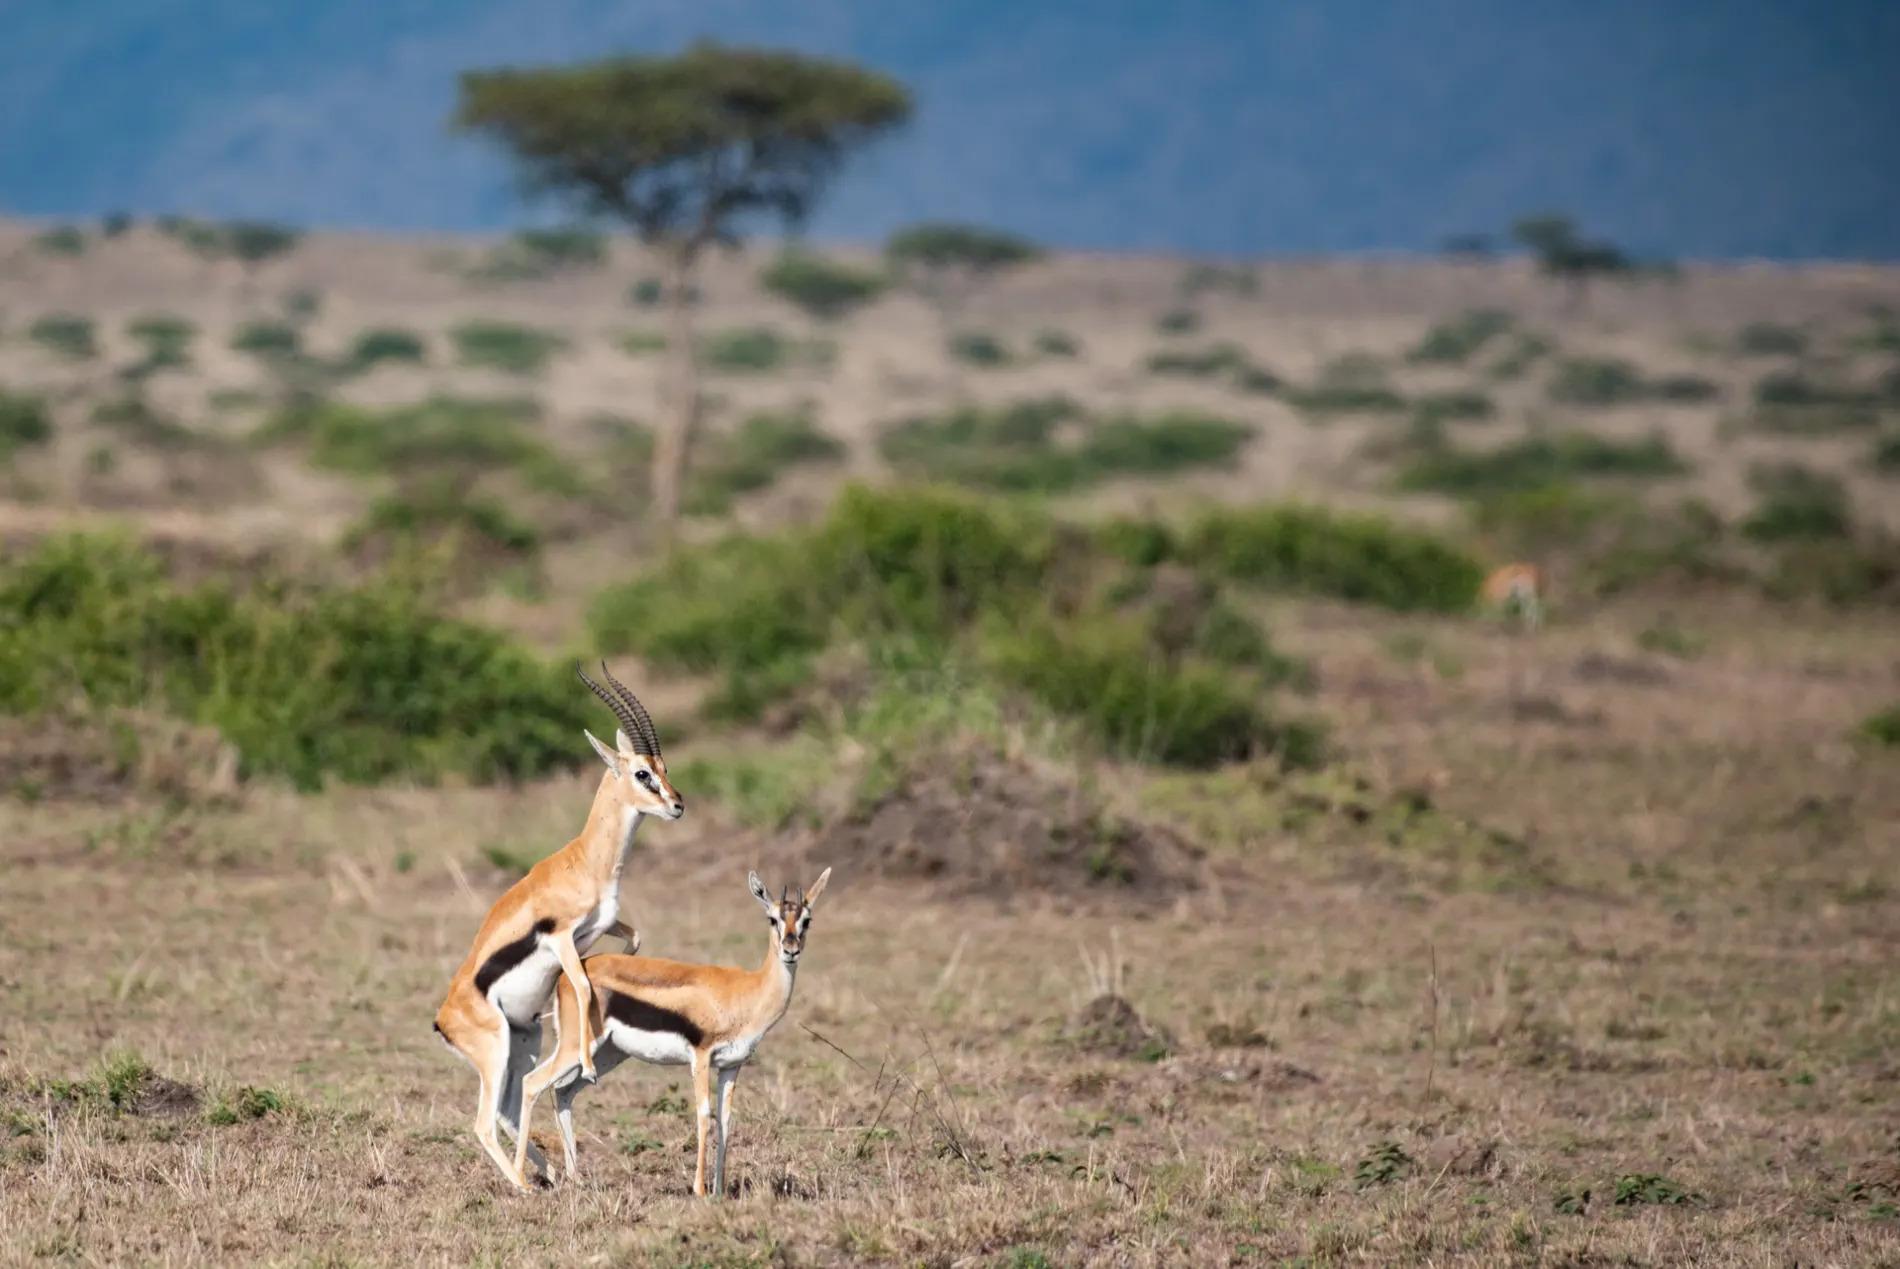 Gazelle mating